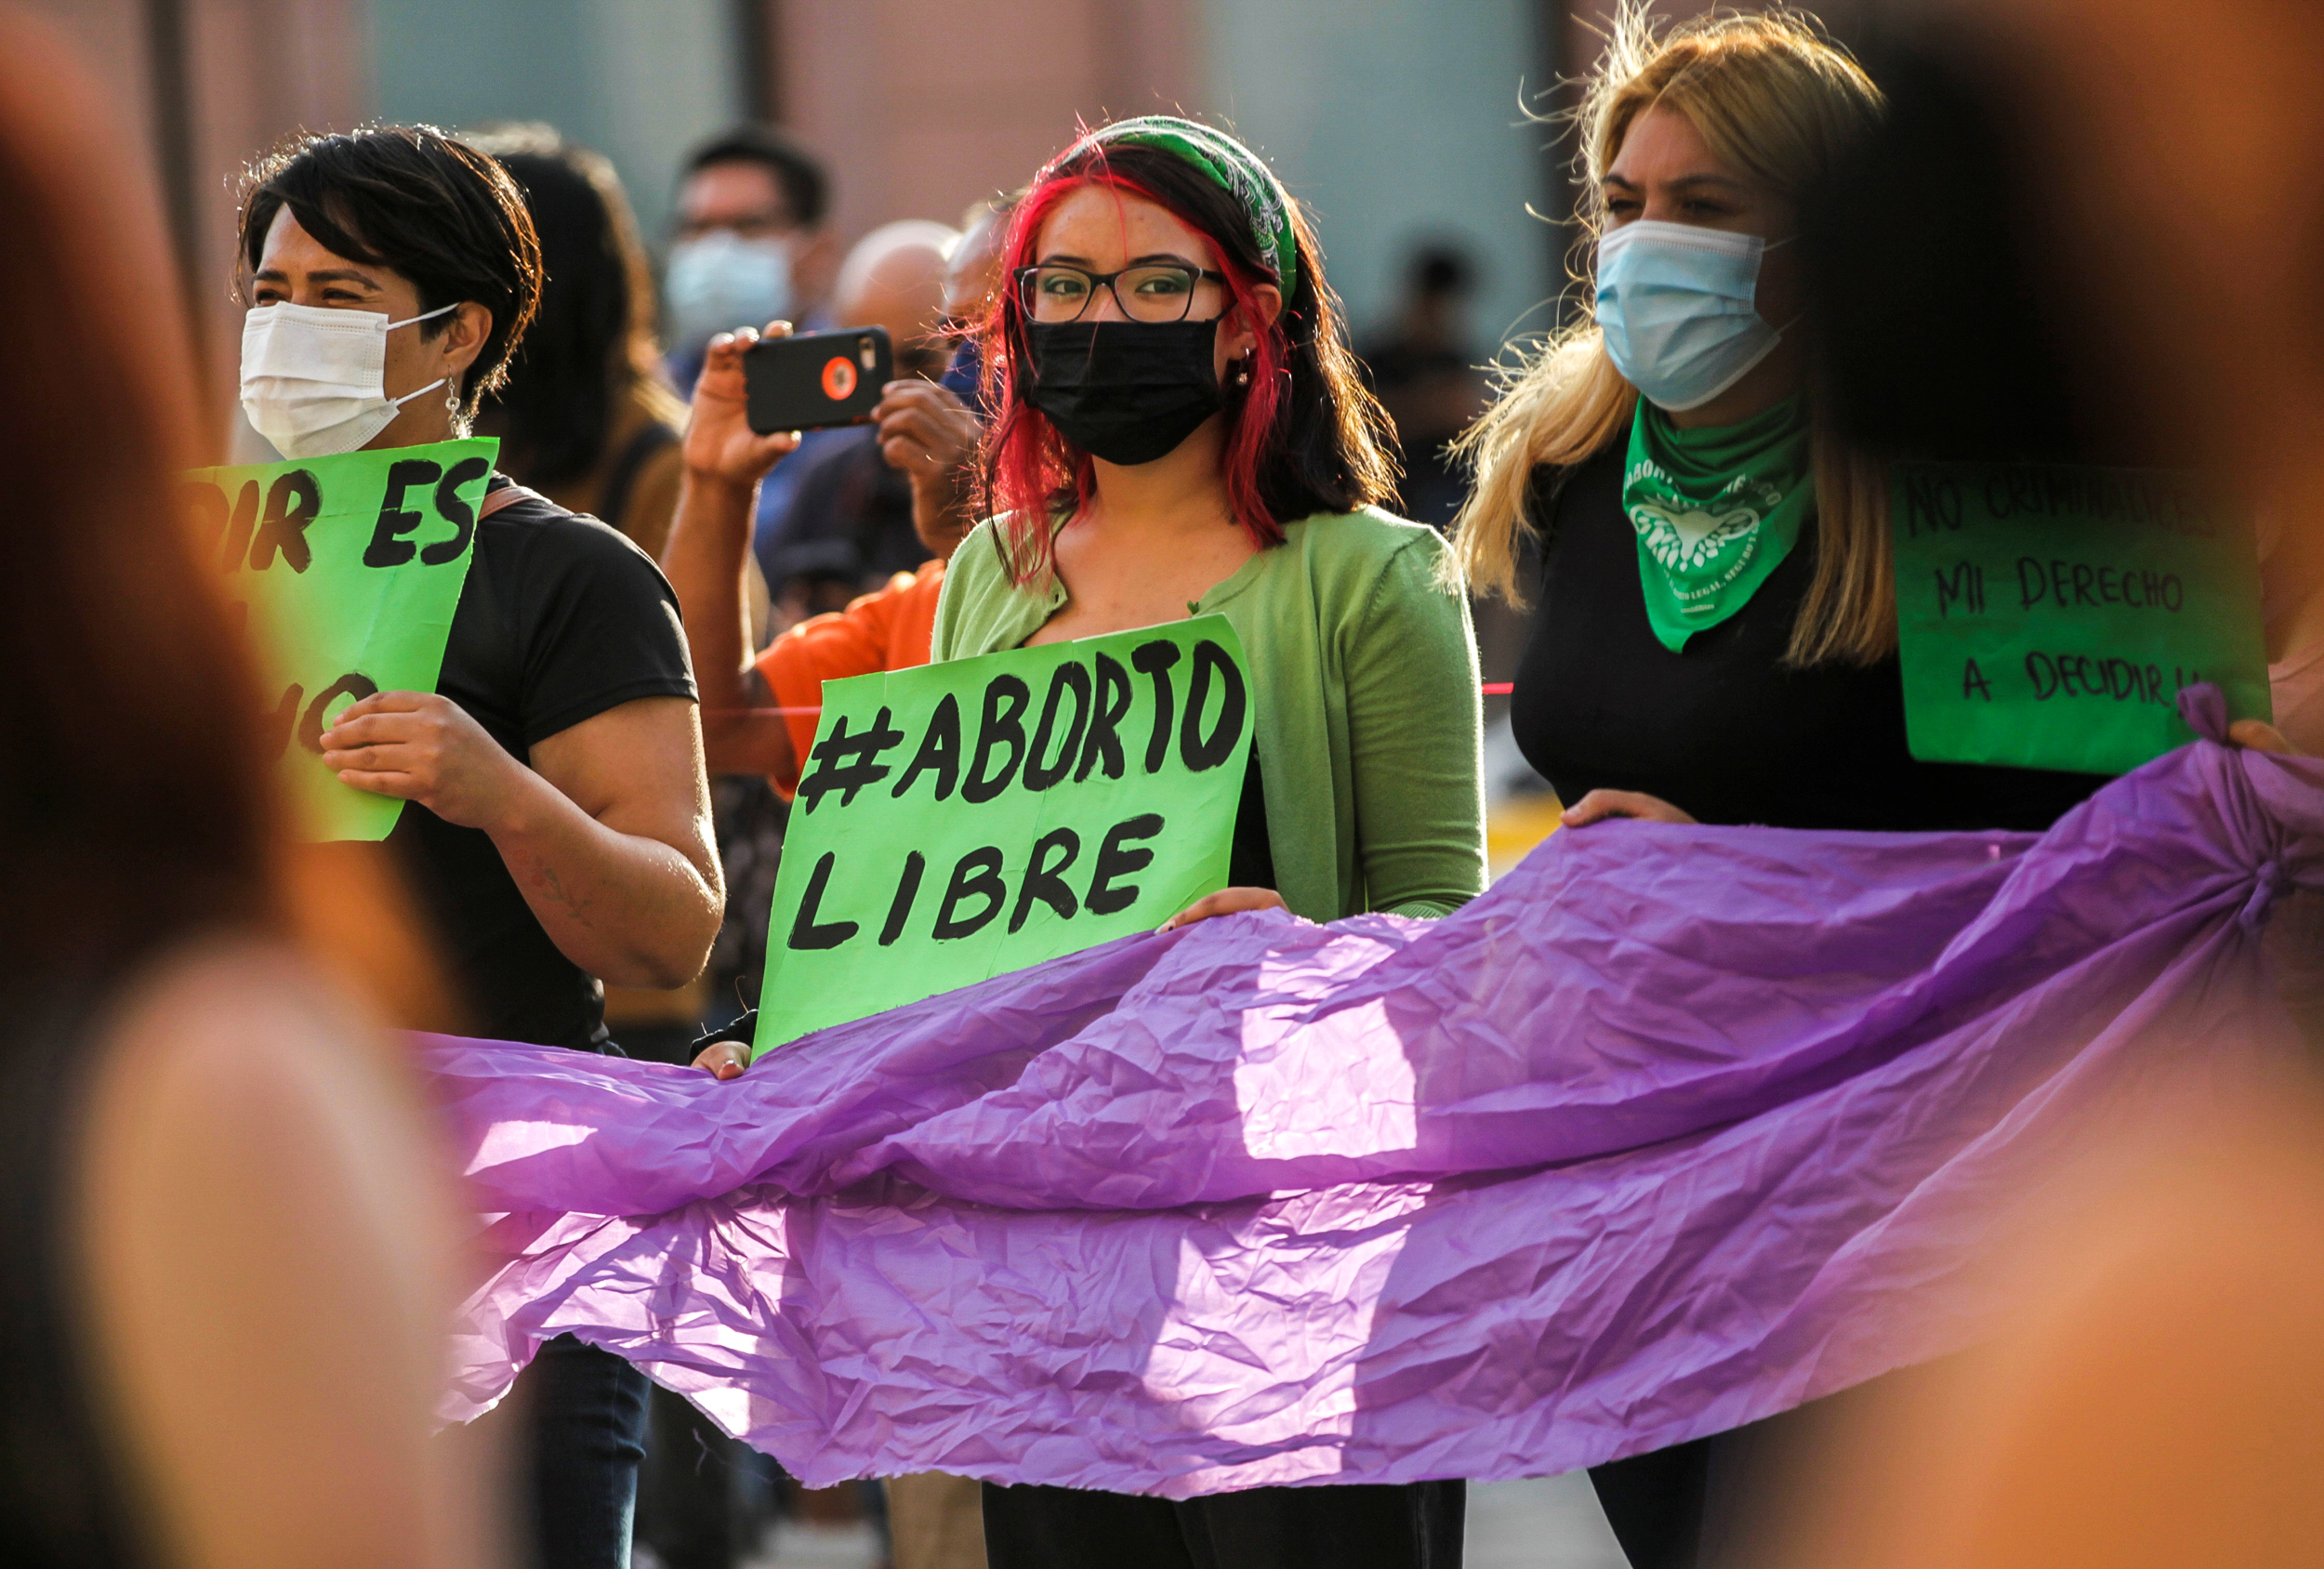 Experts: Mexico's 'milestone' abortion decriminalization is regional game changer